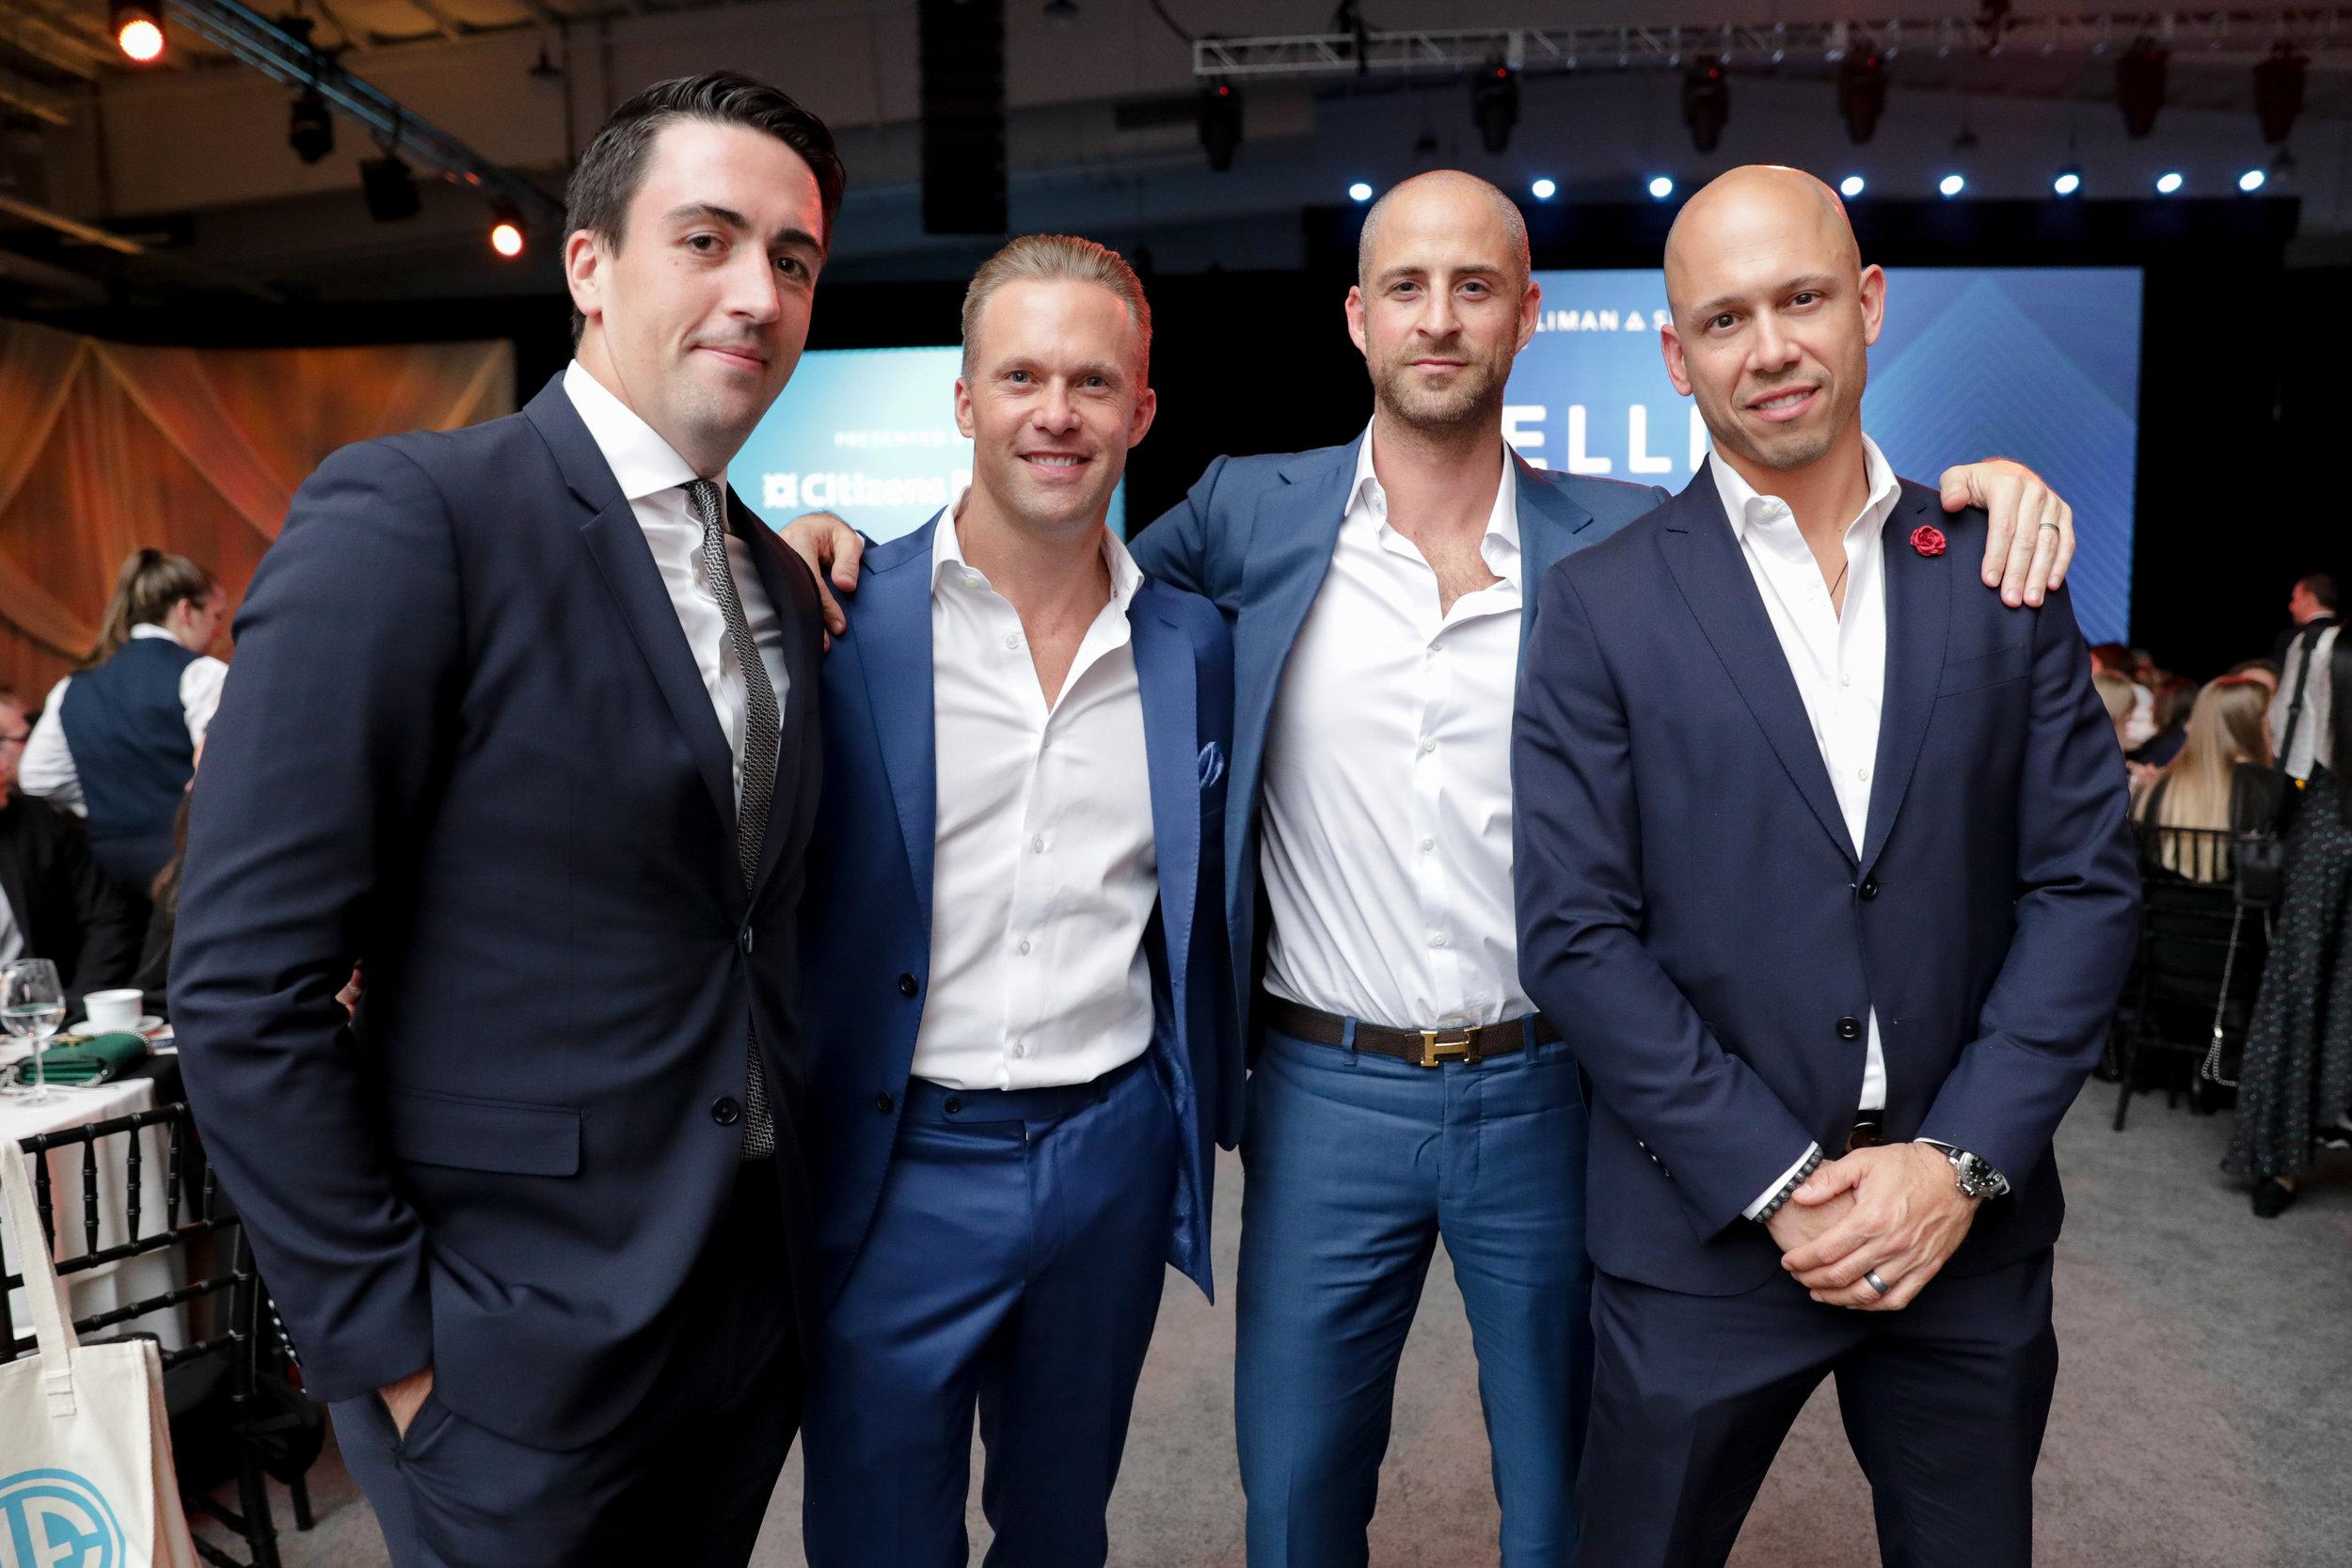 Ethan Pickett, Darin Tansey, Dan Hechtkopf & Bryan Sereny